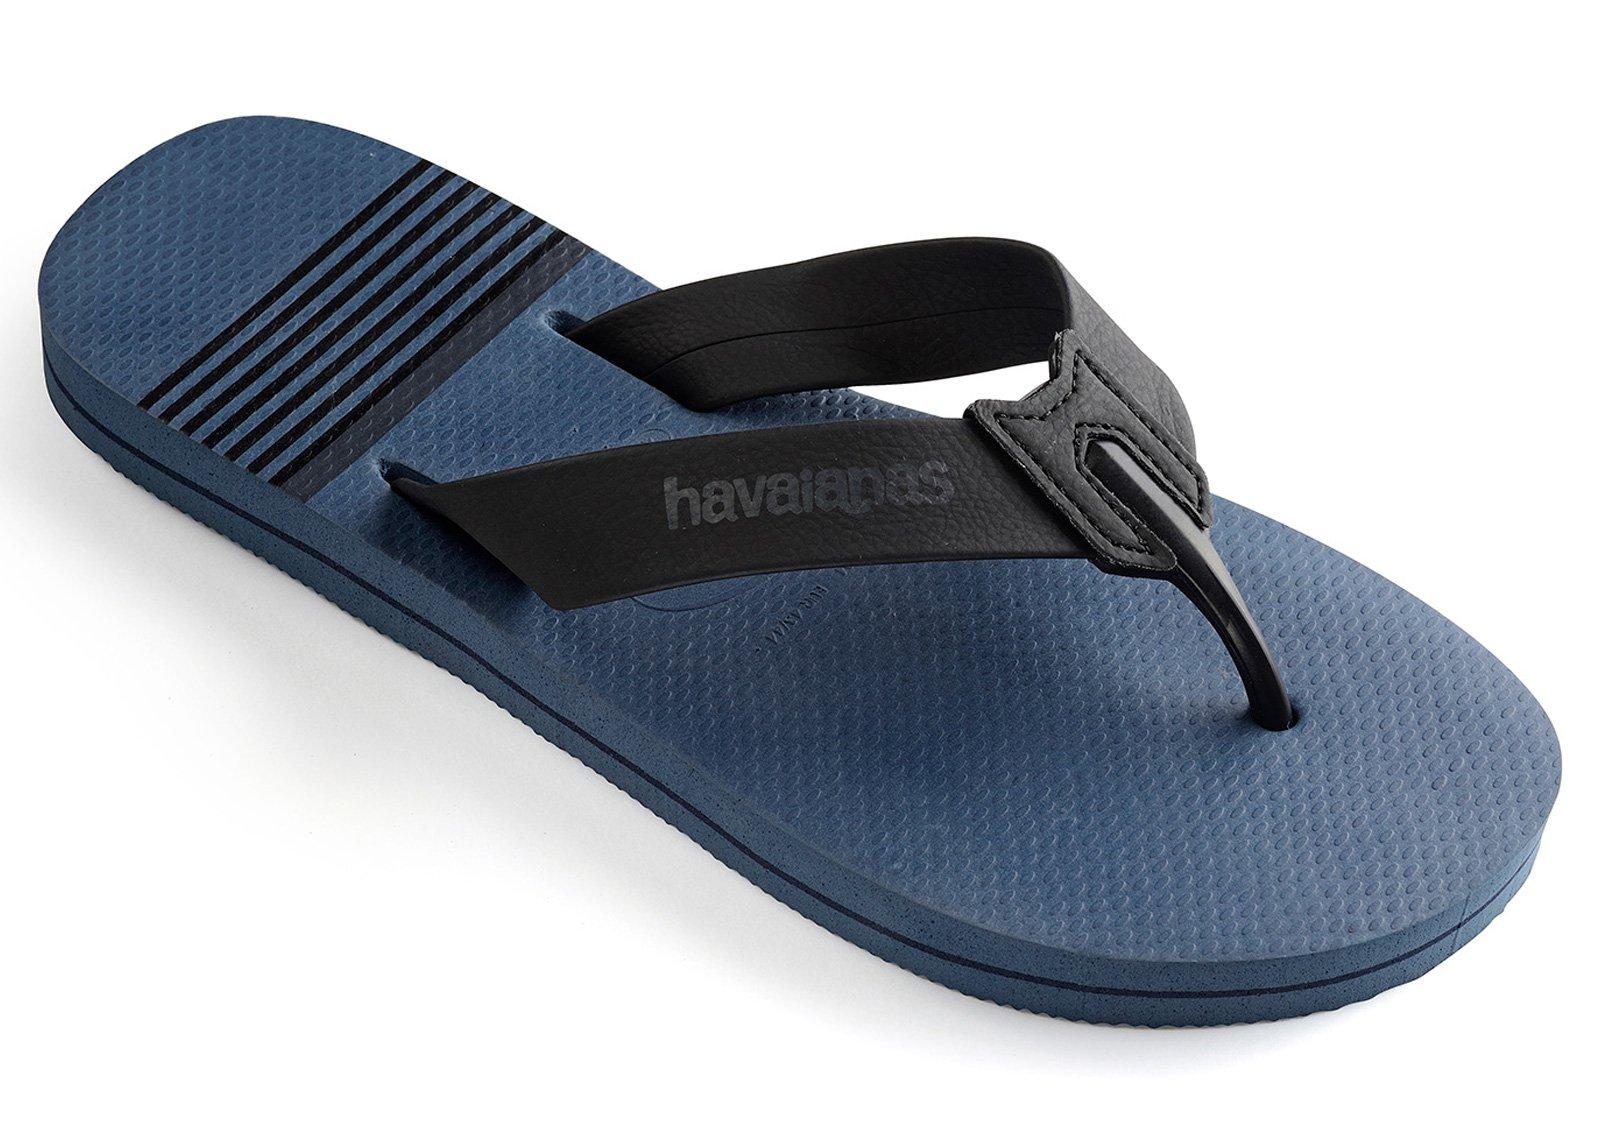 4f7f53b4b Flip-Flops Urban Craft Indigo Blue - Brand Havaianas